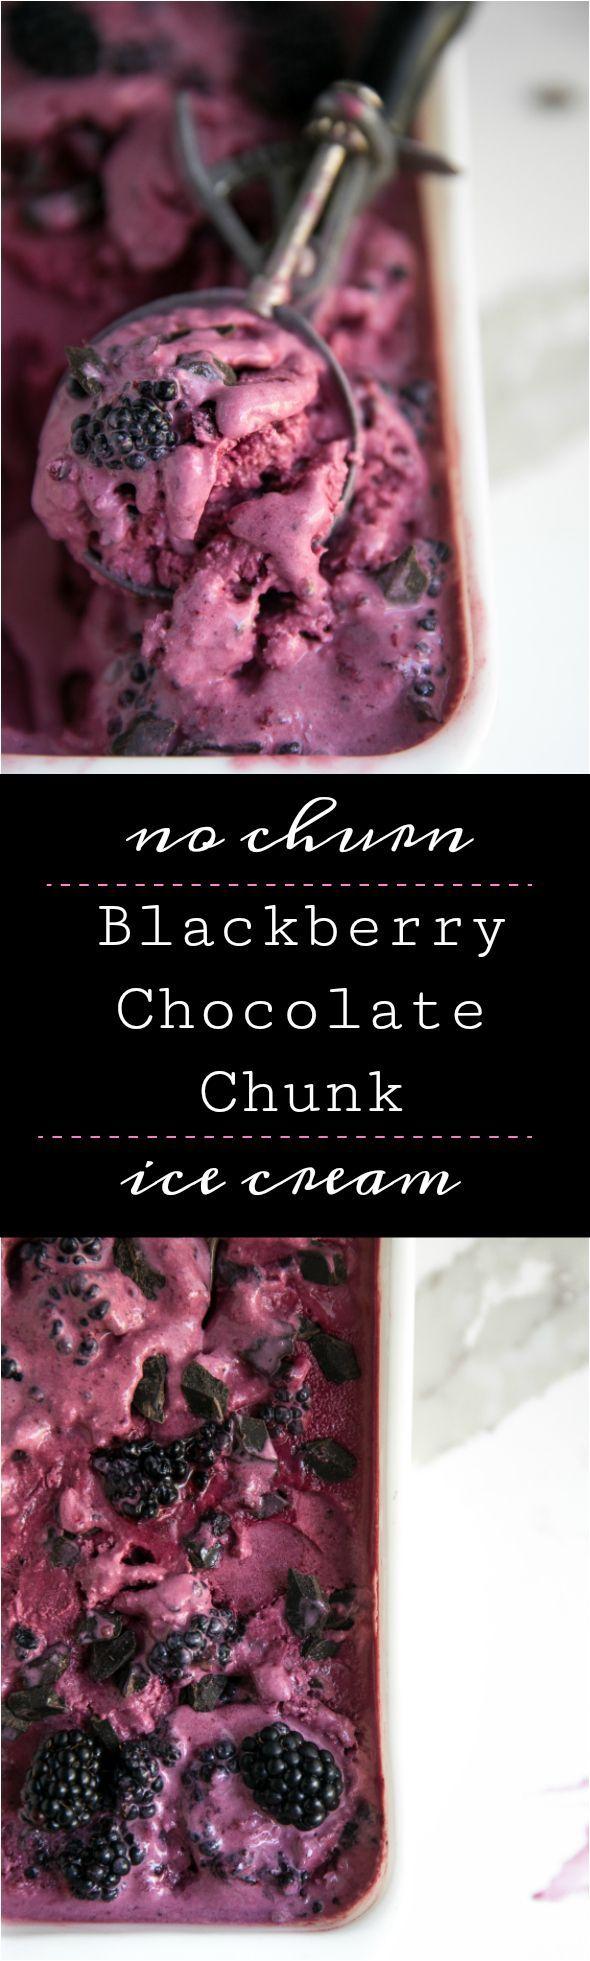 No Churn Blackberry Chocolate Chunk Ice Cream #icecream #homemade #easy #dessert #sweets #chocolte #blackberries #summer